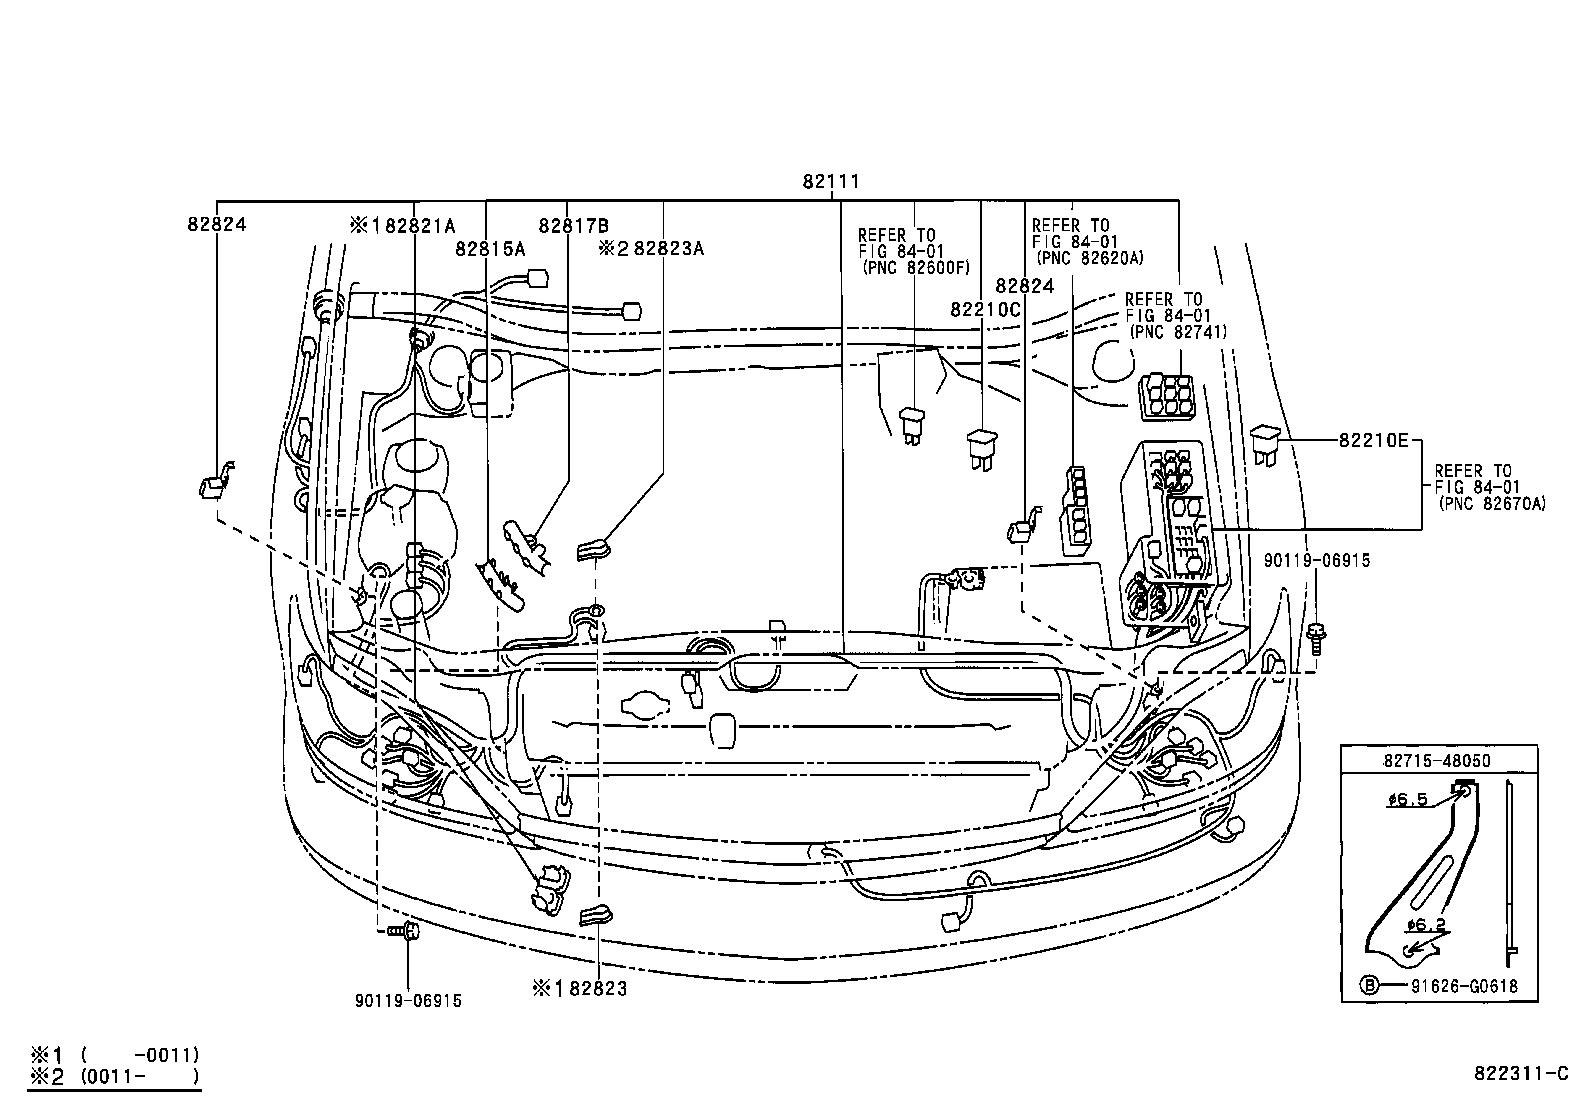 2003 honda odyssey parts diagram ceiling fan wiring diagrams toyota corolla engine html